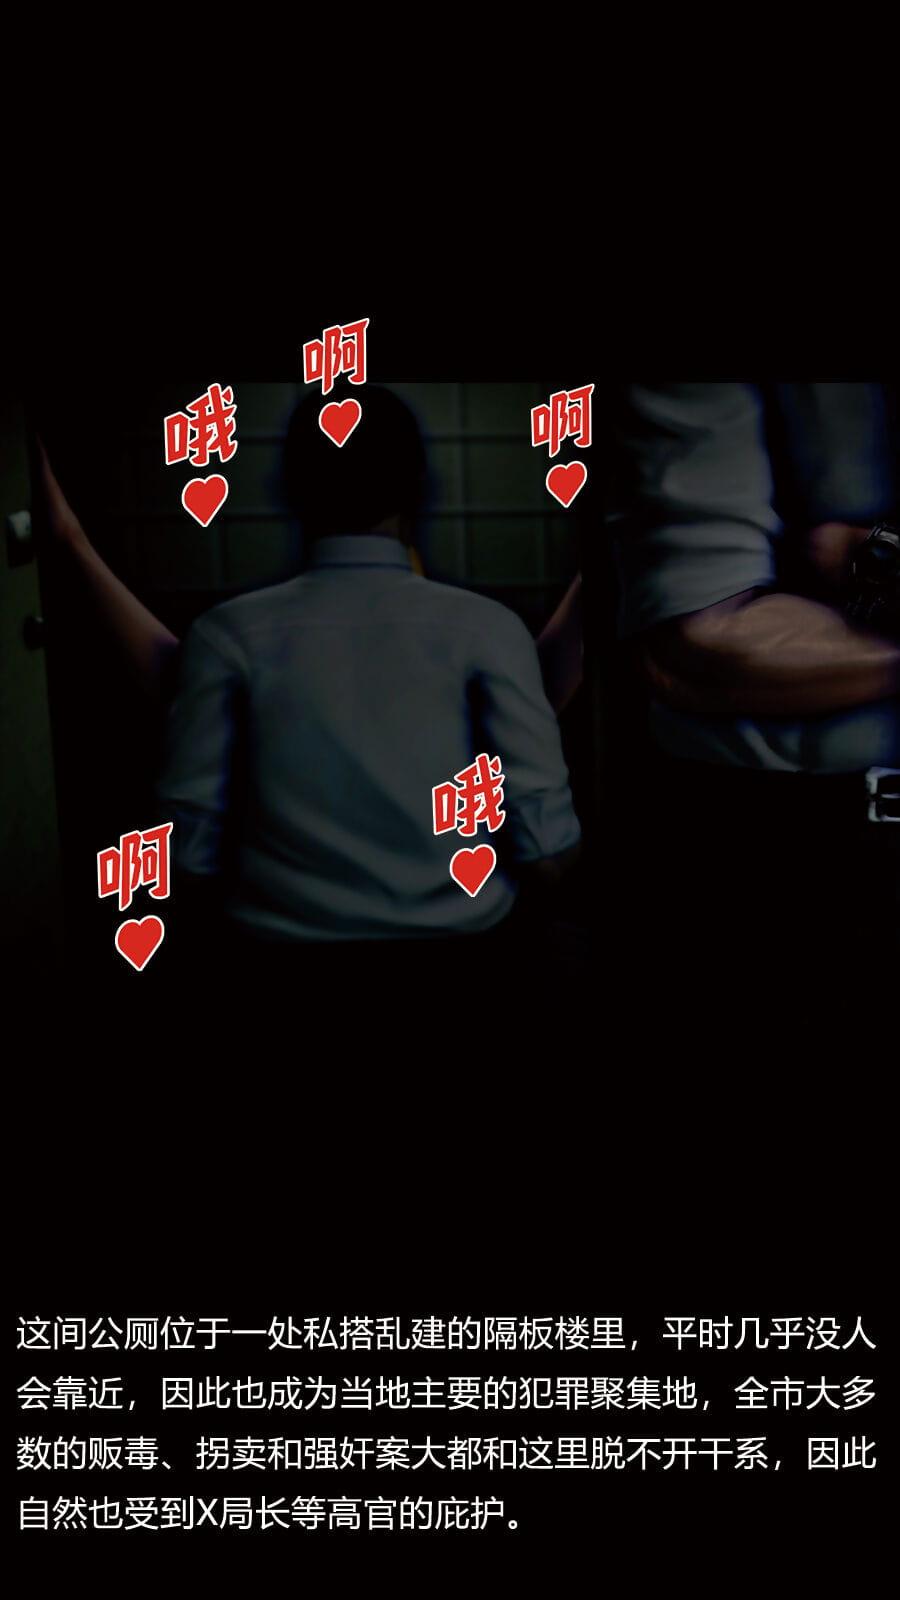 HornCriminal Net暗网淫欲都市R1- Faithfulness 4 - 张倩篇 - accouterment 4